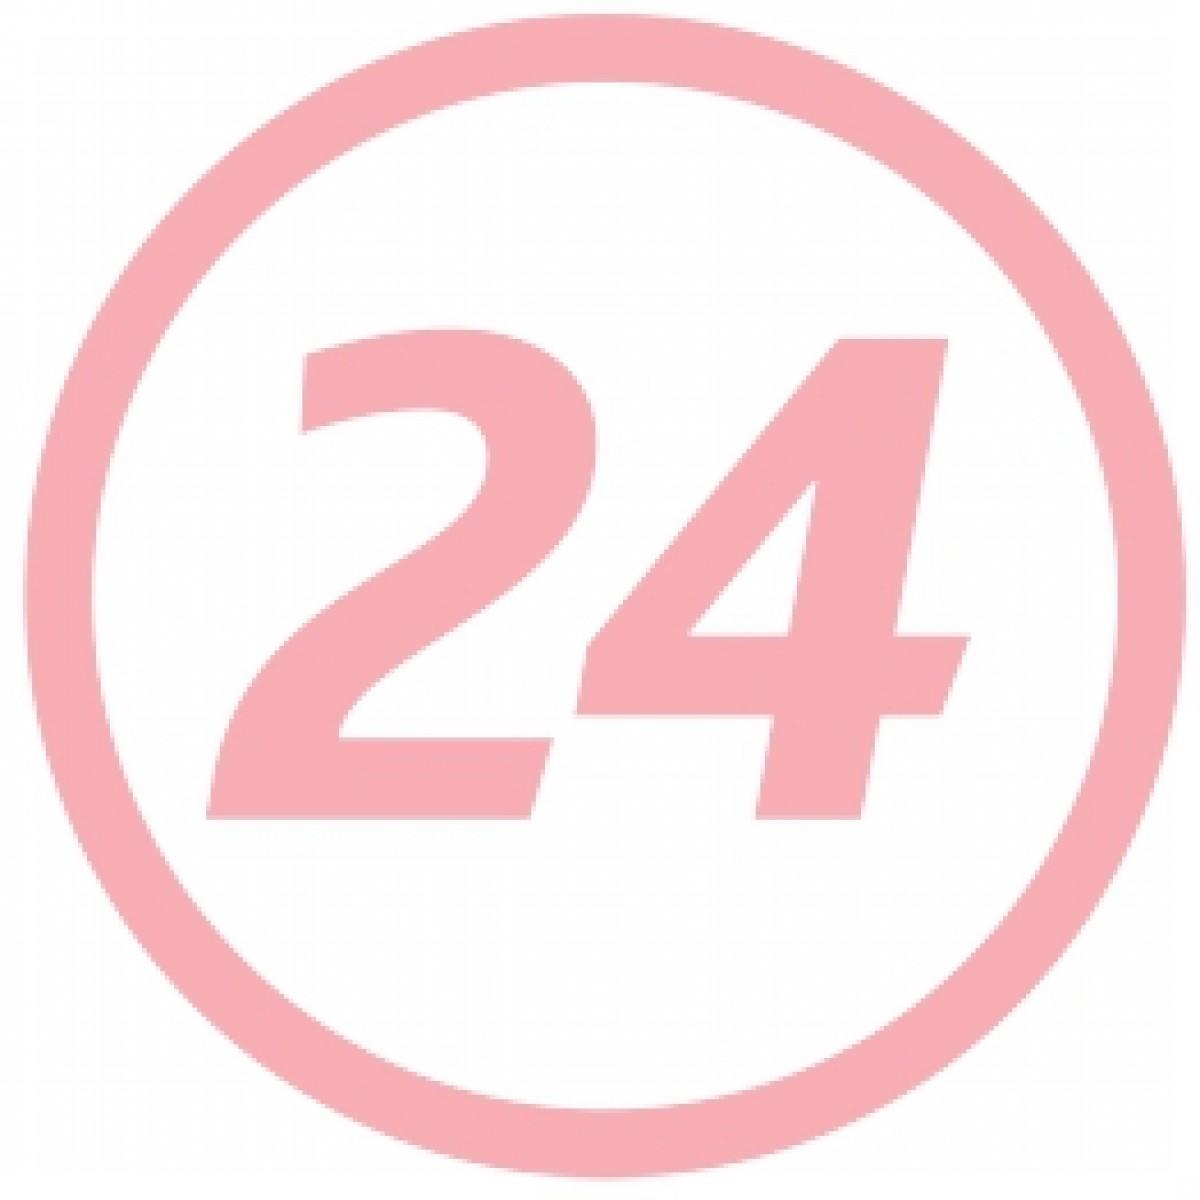 Nurofen Copii 125 mg Supozitoare 2+, Supozitoare, 10buc